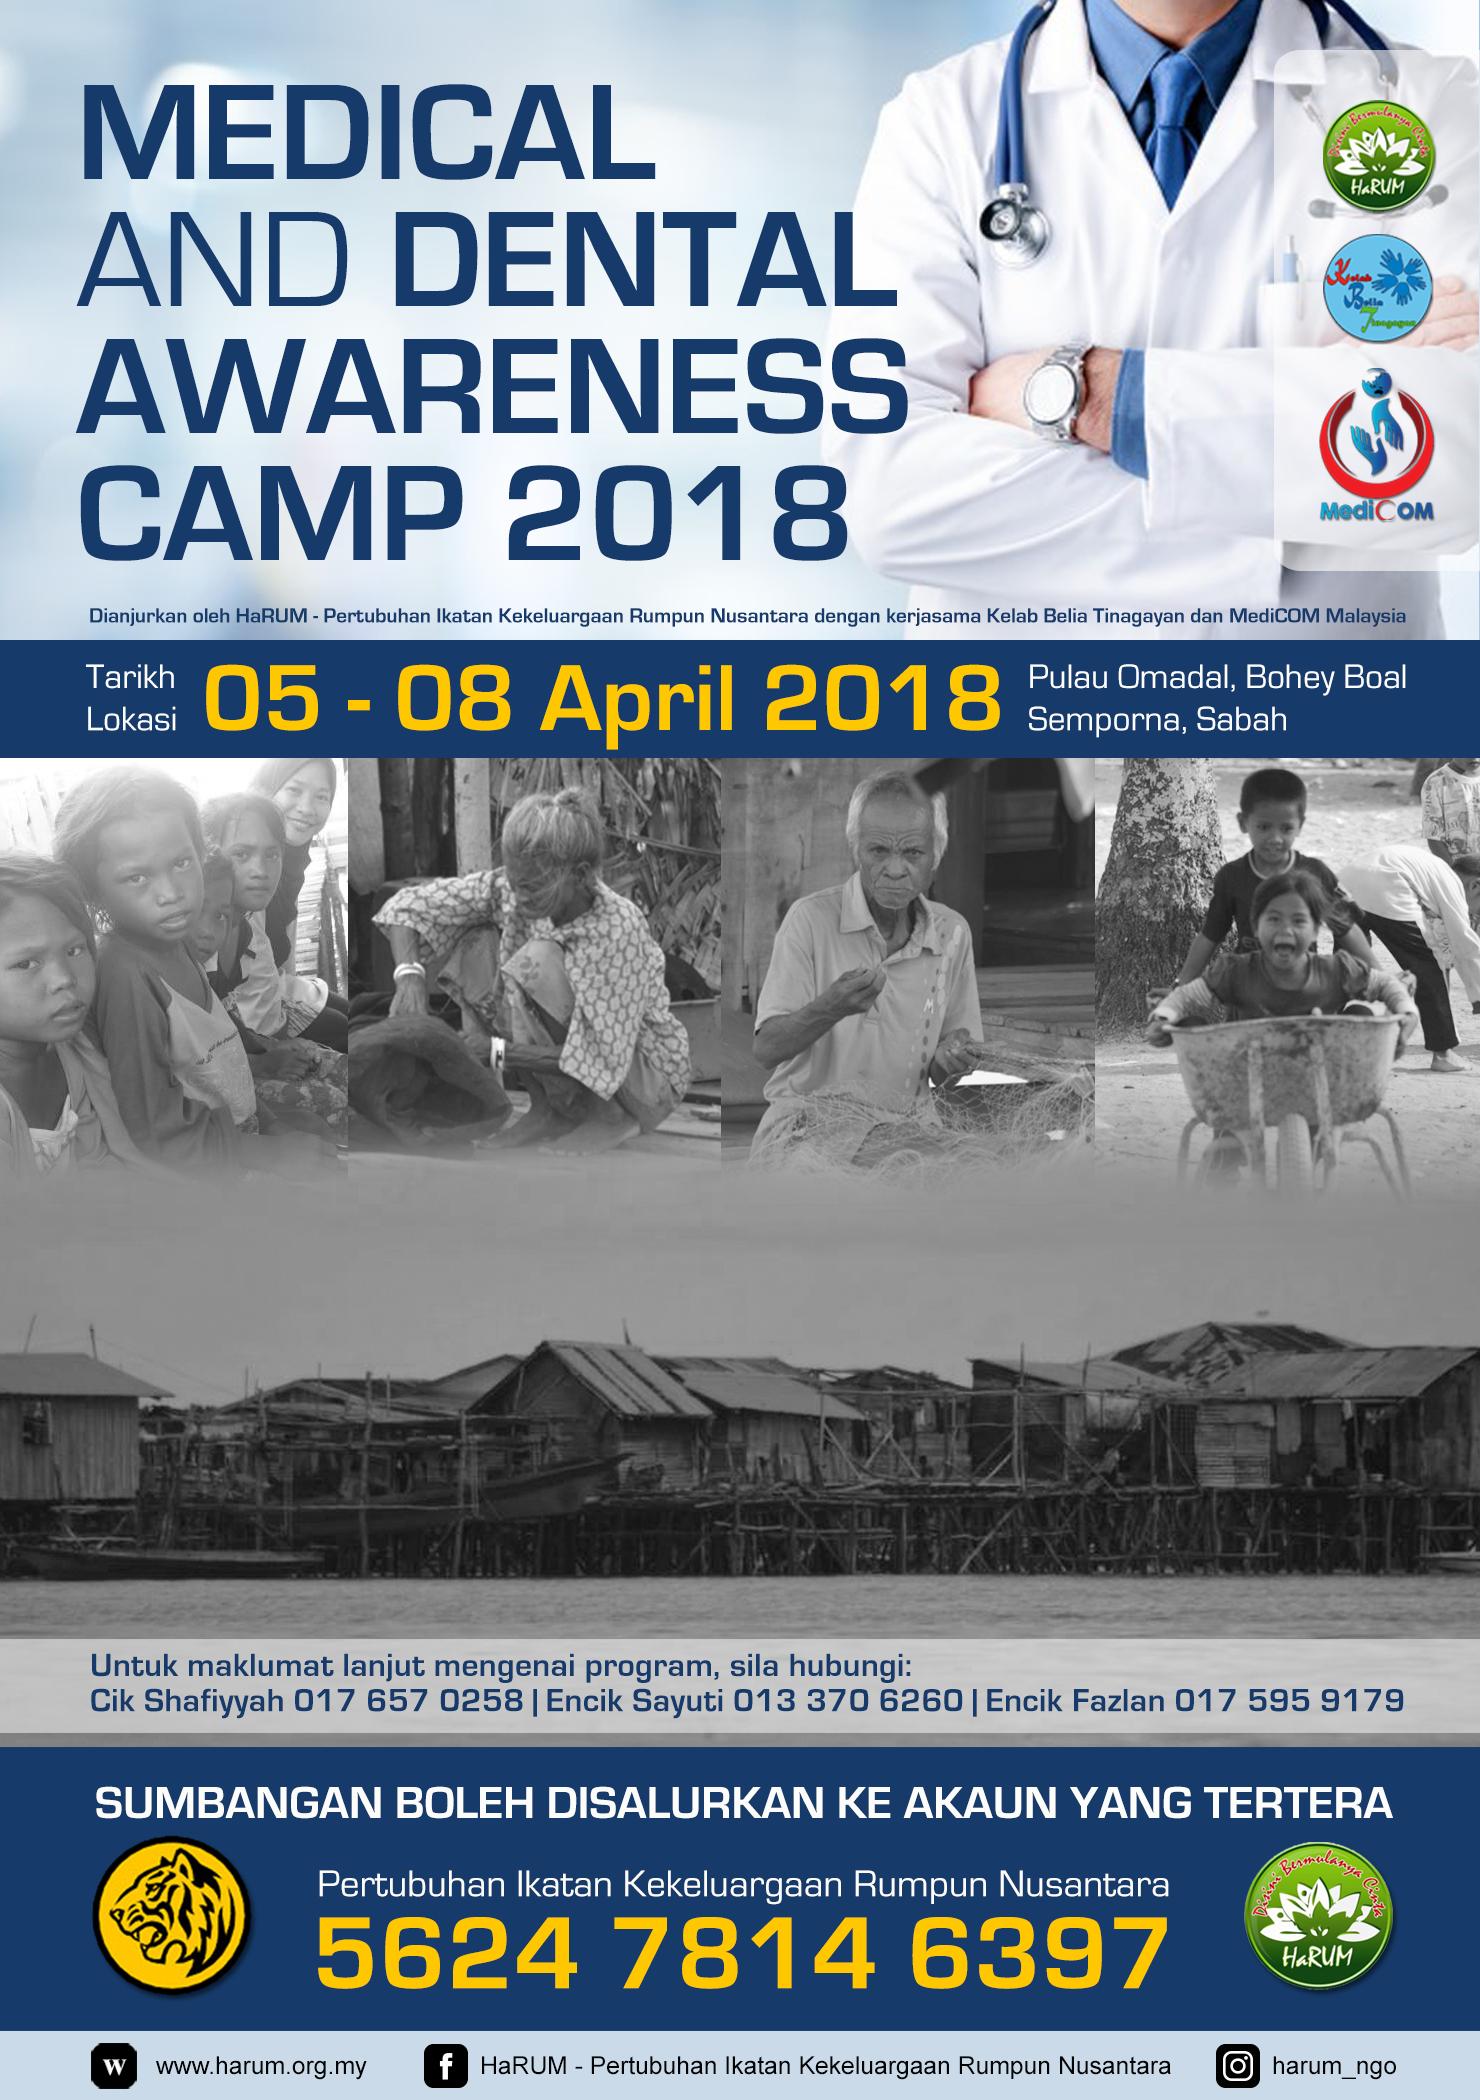 Medical And Dental Awareness Camp 2018